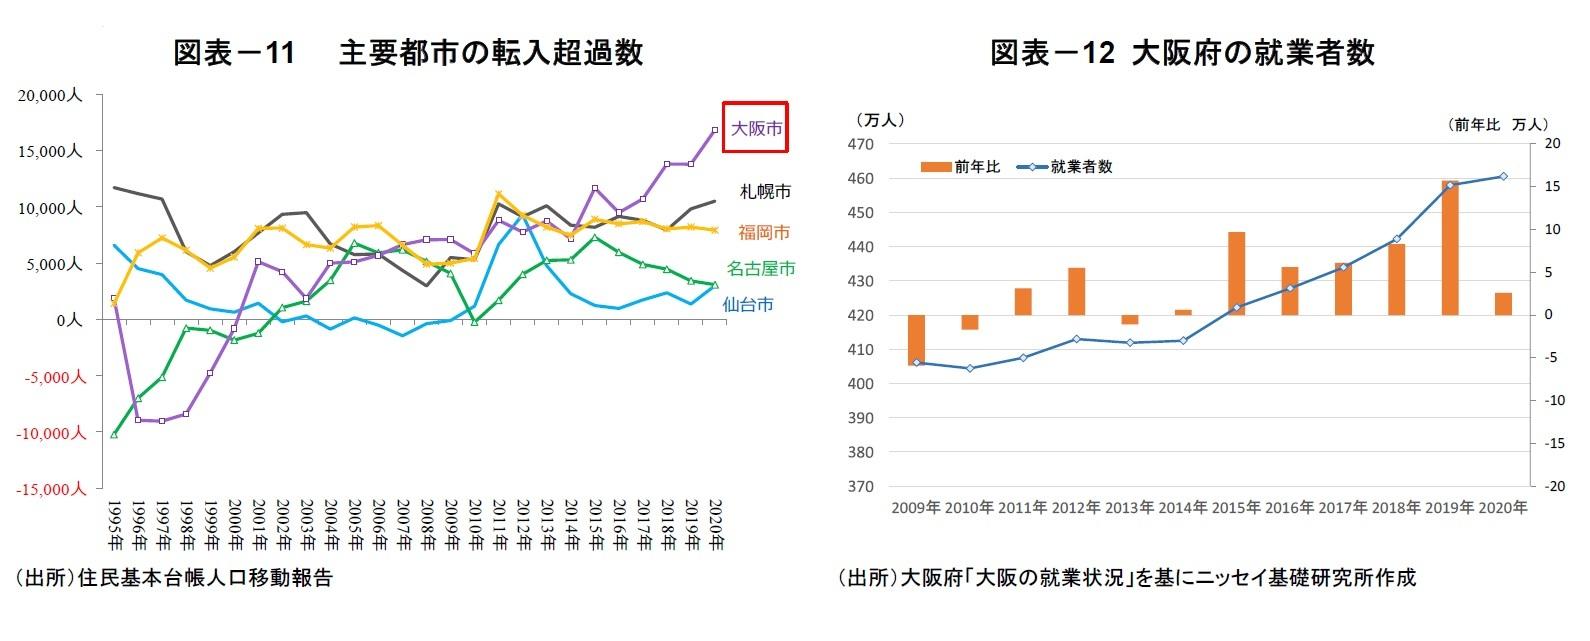 図表-11 主要都市の転入超過数/図表-12 大阪府の就業者数